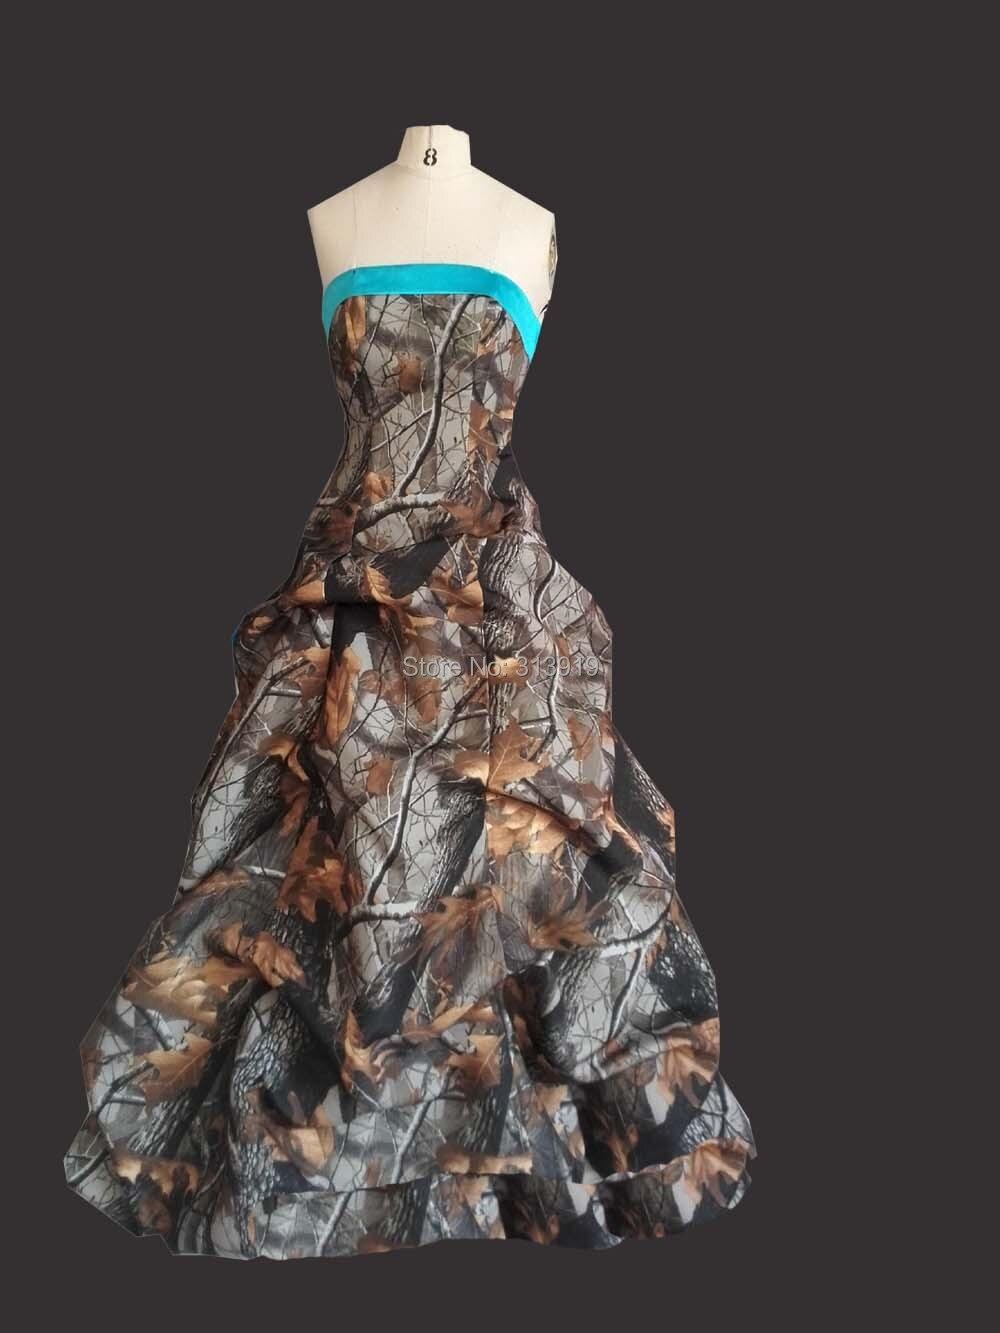 Luxury Orange Camo Prom Dresses Photo - Wedding Dress Ideas ...